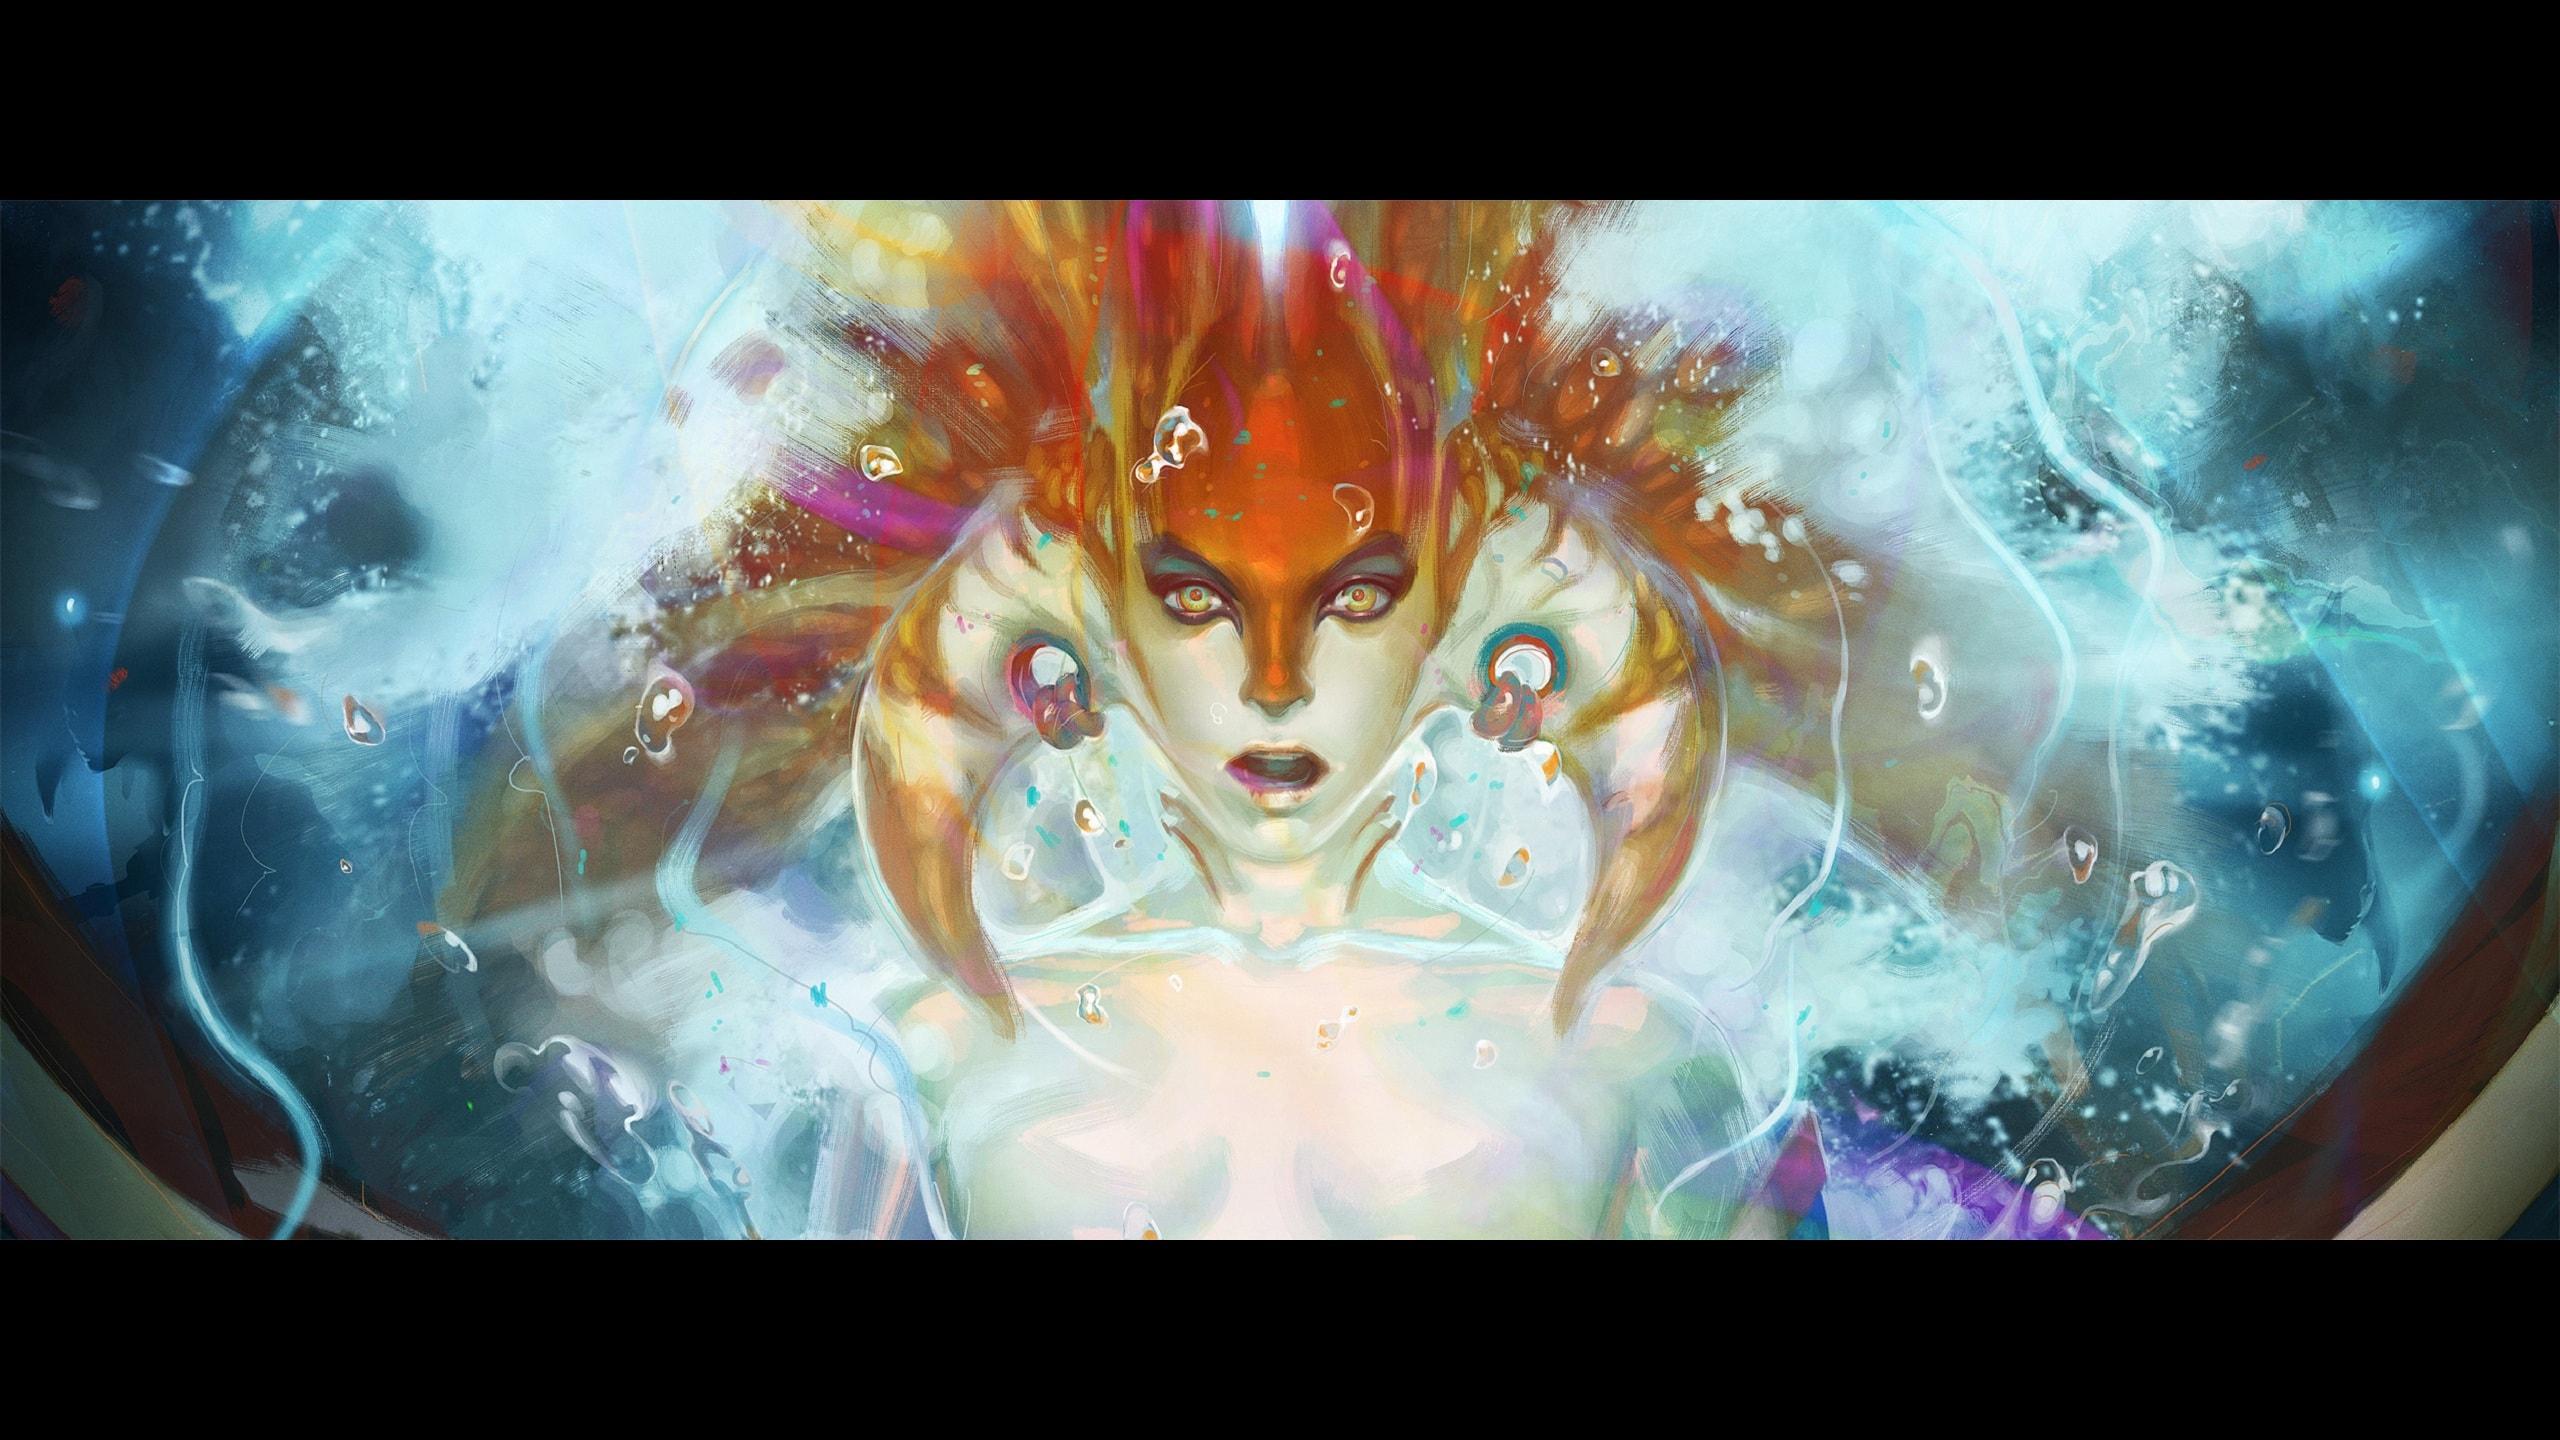 Dota2 : Naga Siren Wallpapers hd